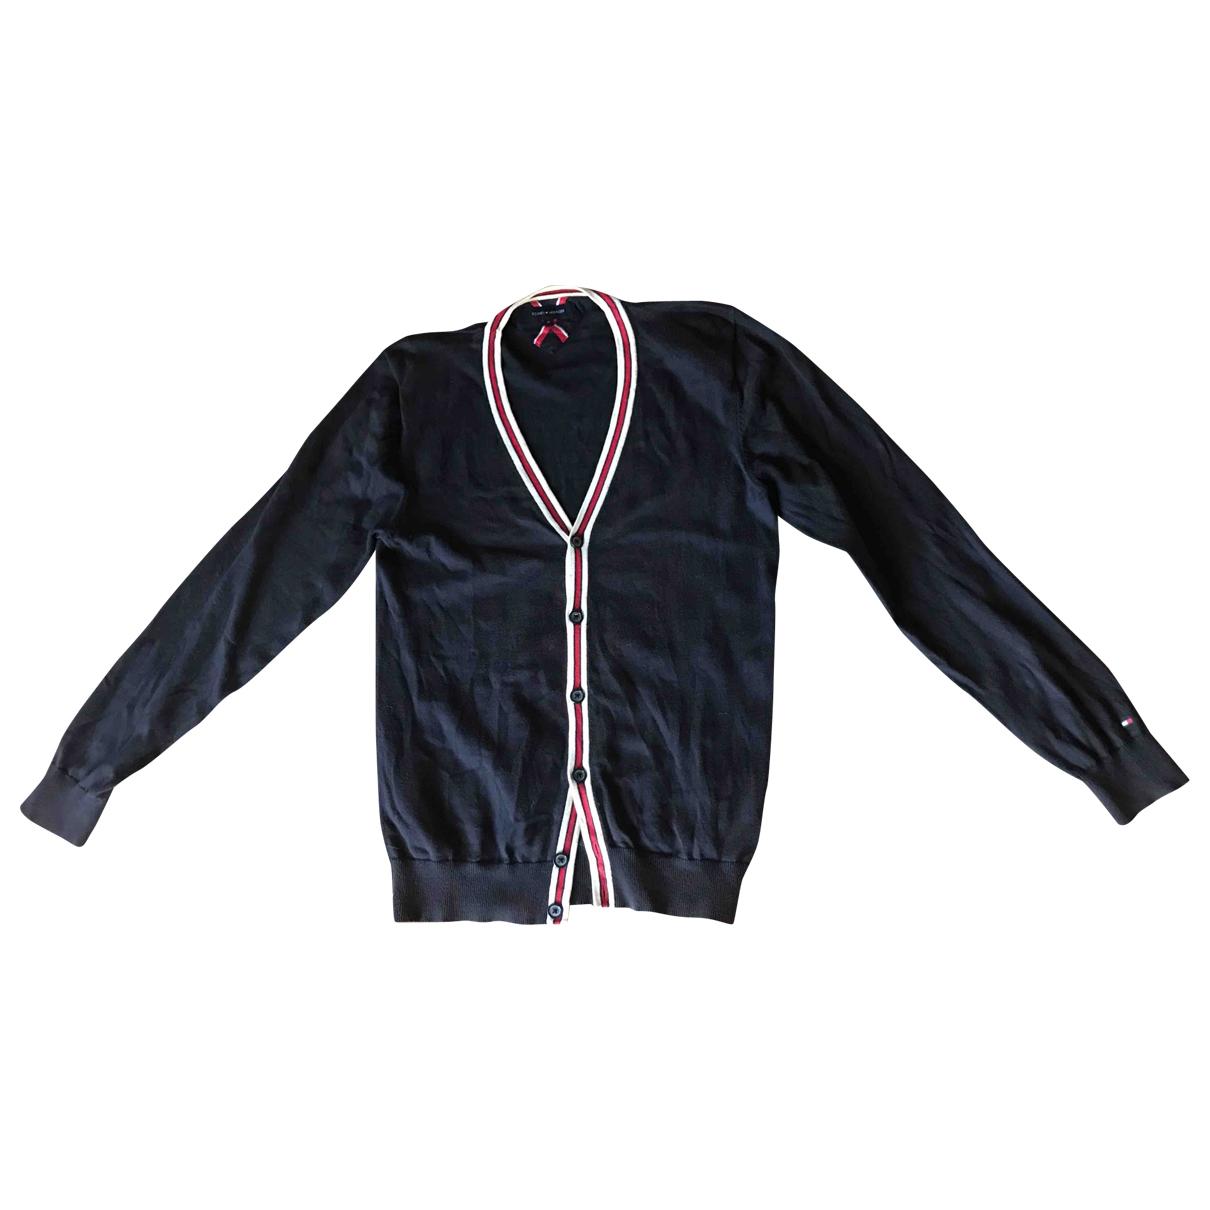 Tommy Hilfiger \N Blue Cotton Knitwear & Sweatshirts for Men M International